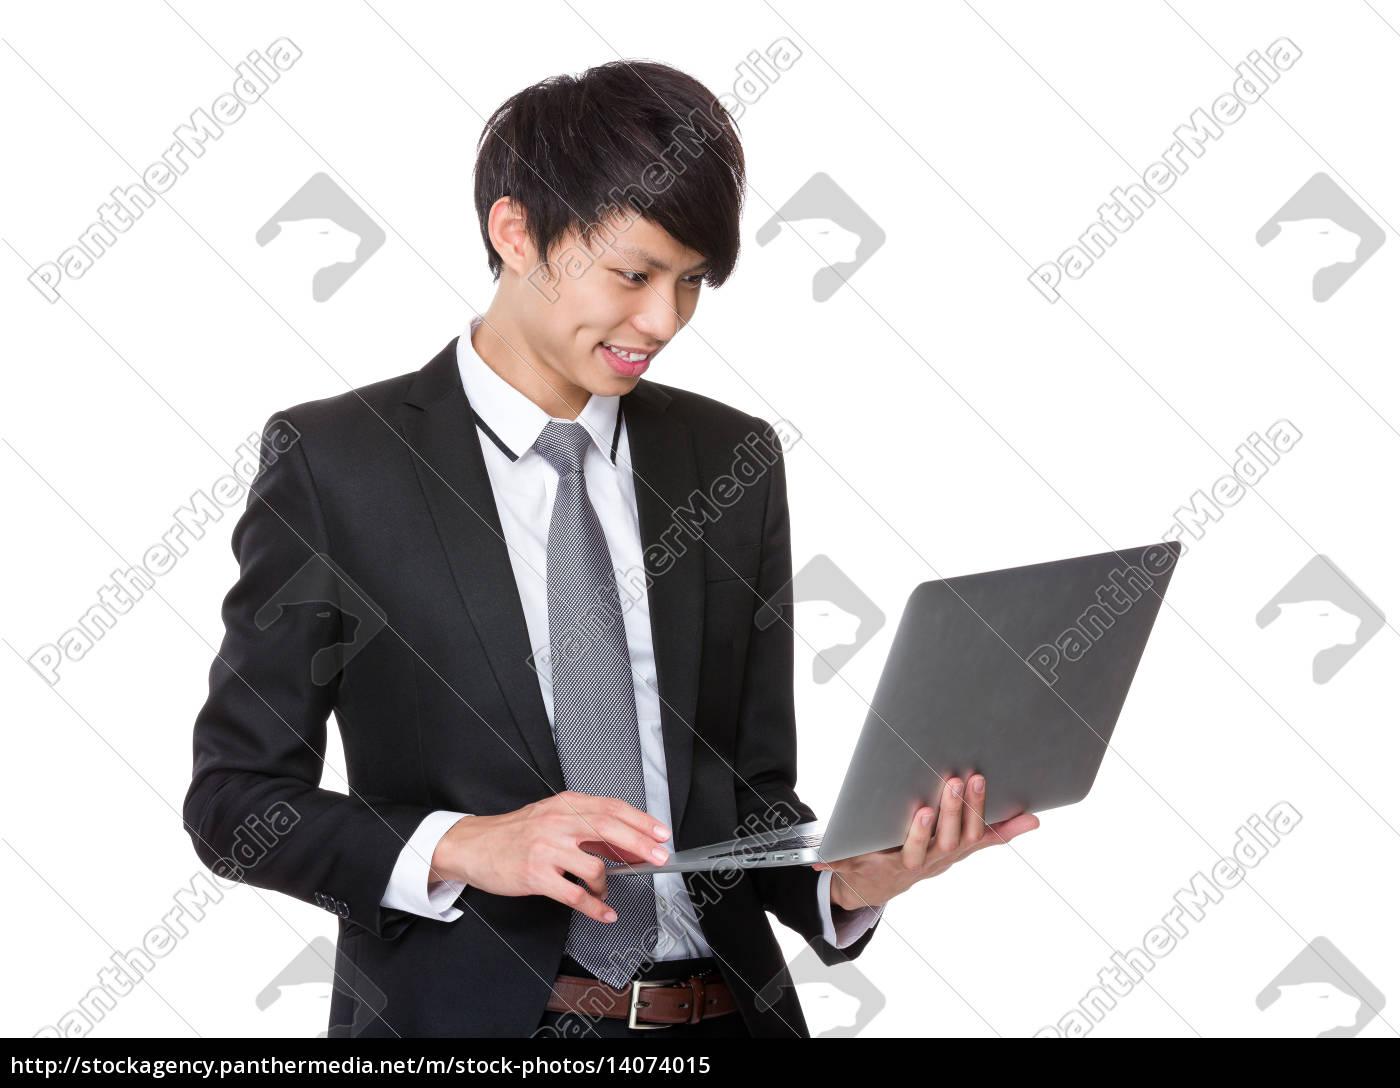 businessman, use, of, laptop - 14074015